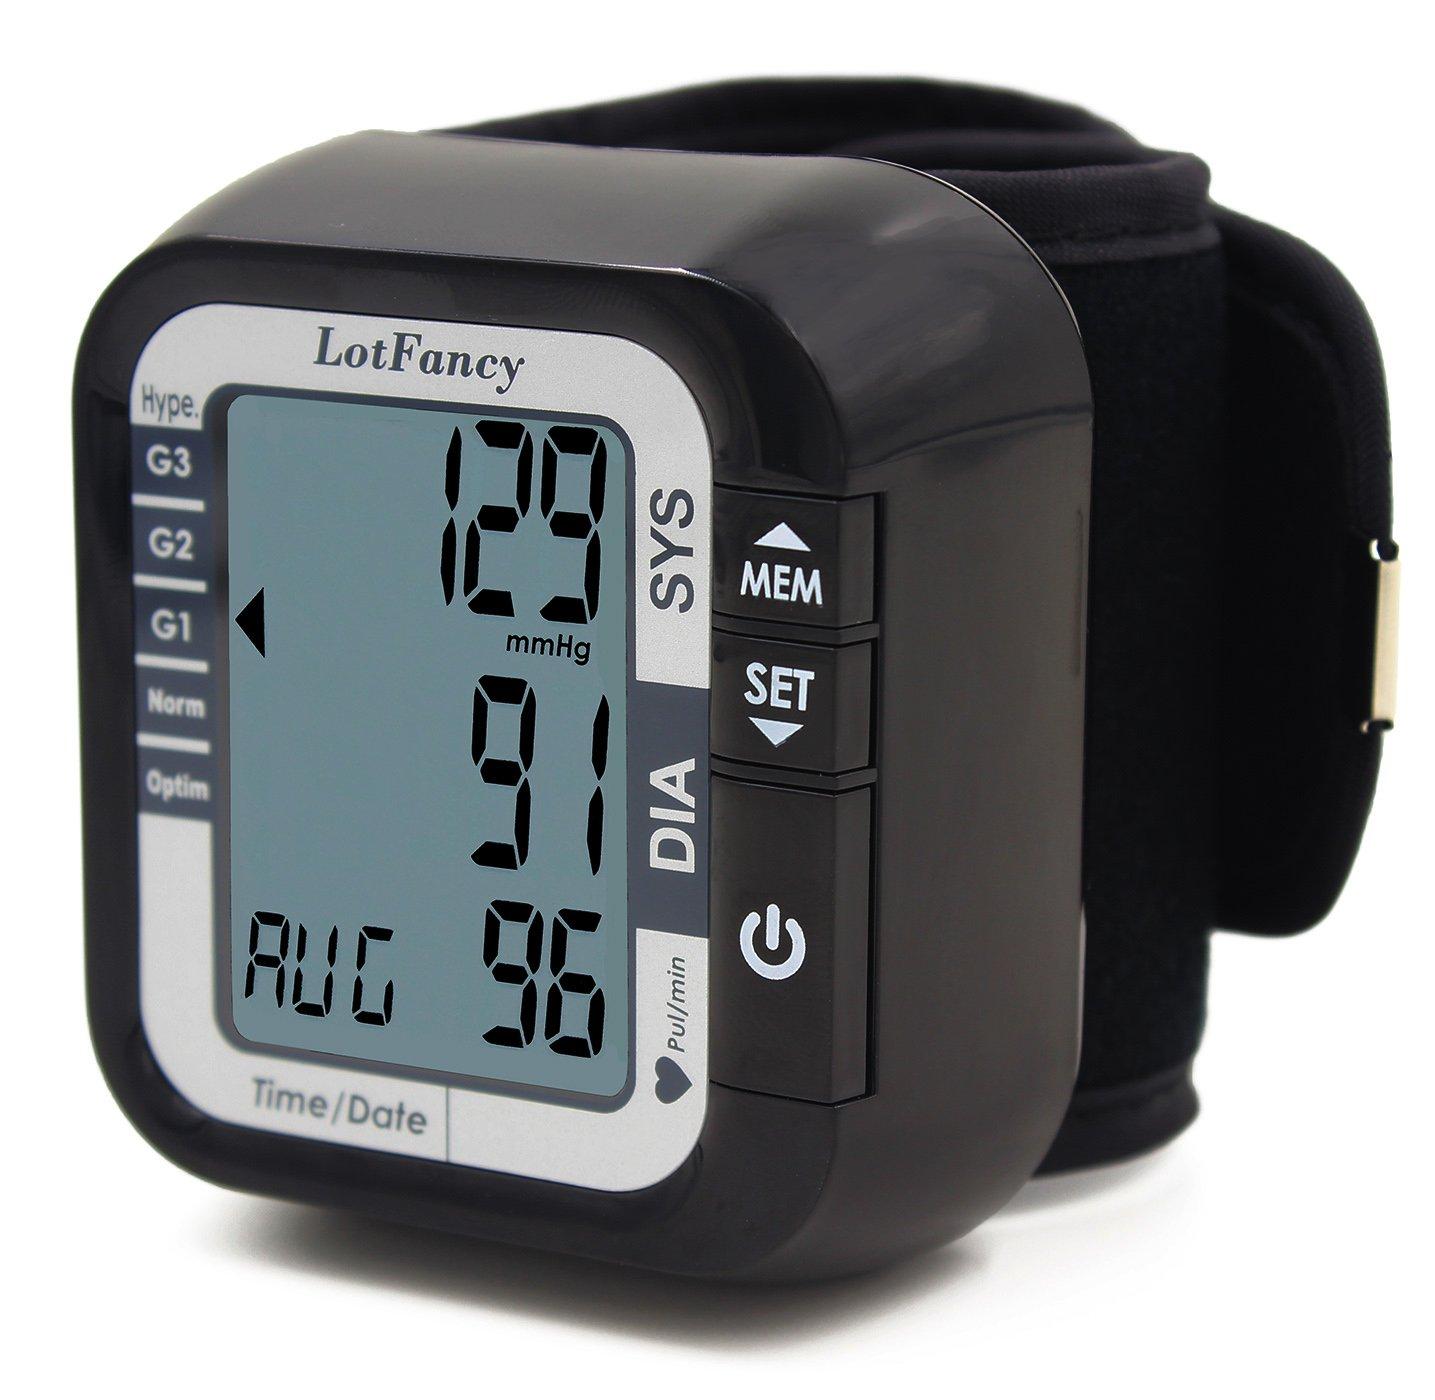 LotFancy TMB-1117 Wrist Type Blood Pressure..